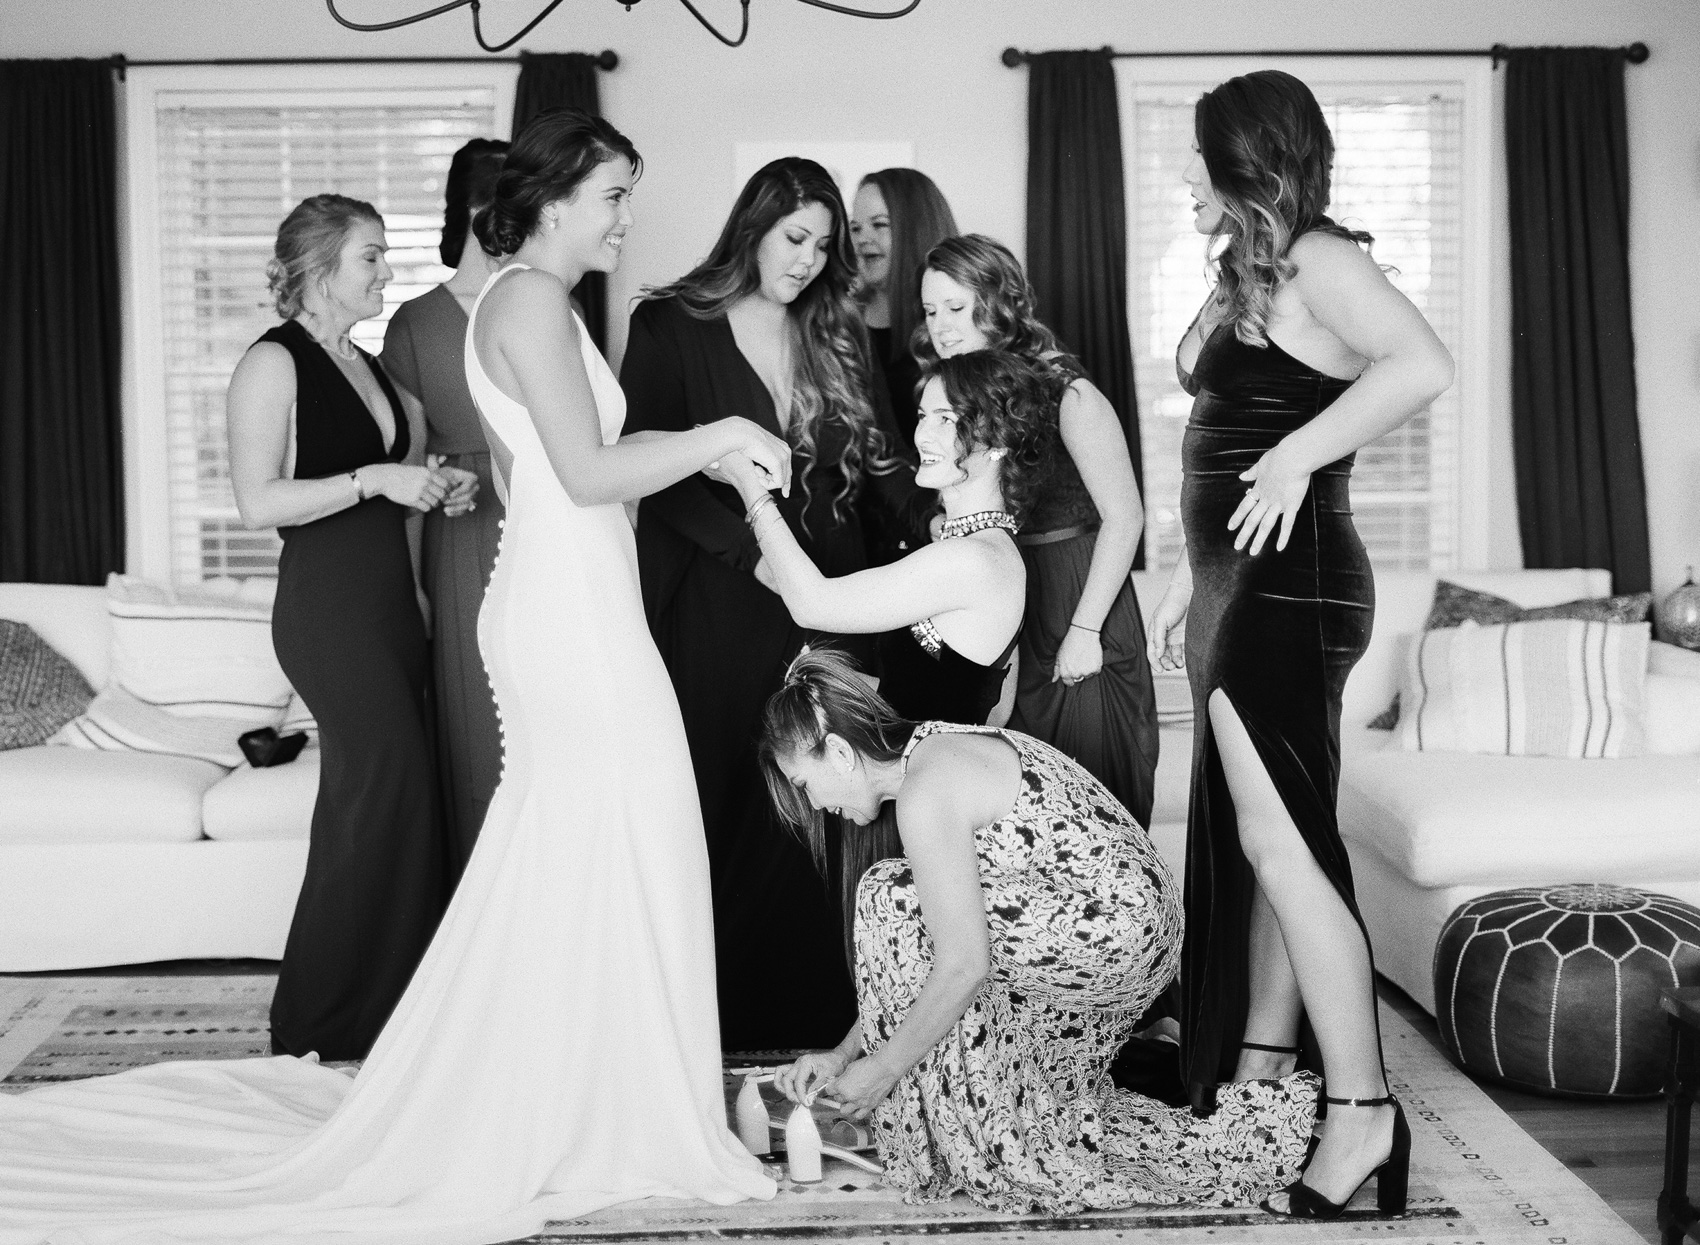 Asheville-Wedding-Venue-Film-Photographer-009.jpg